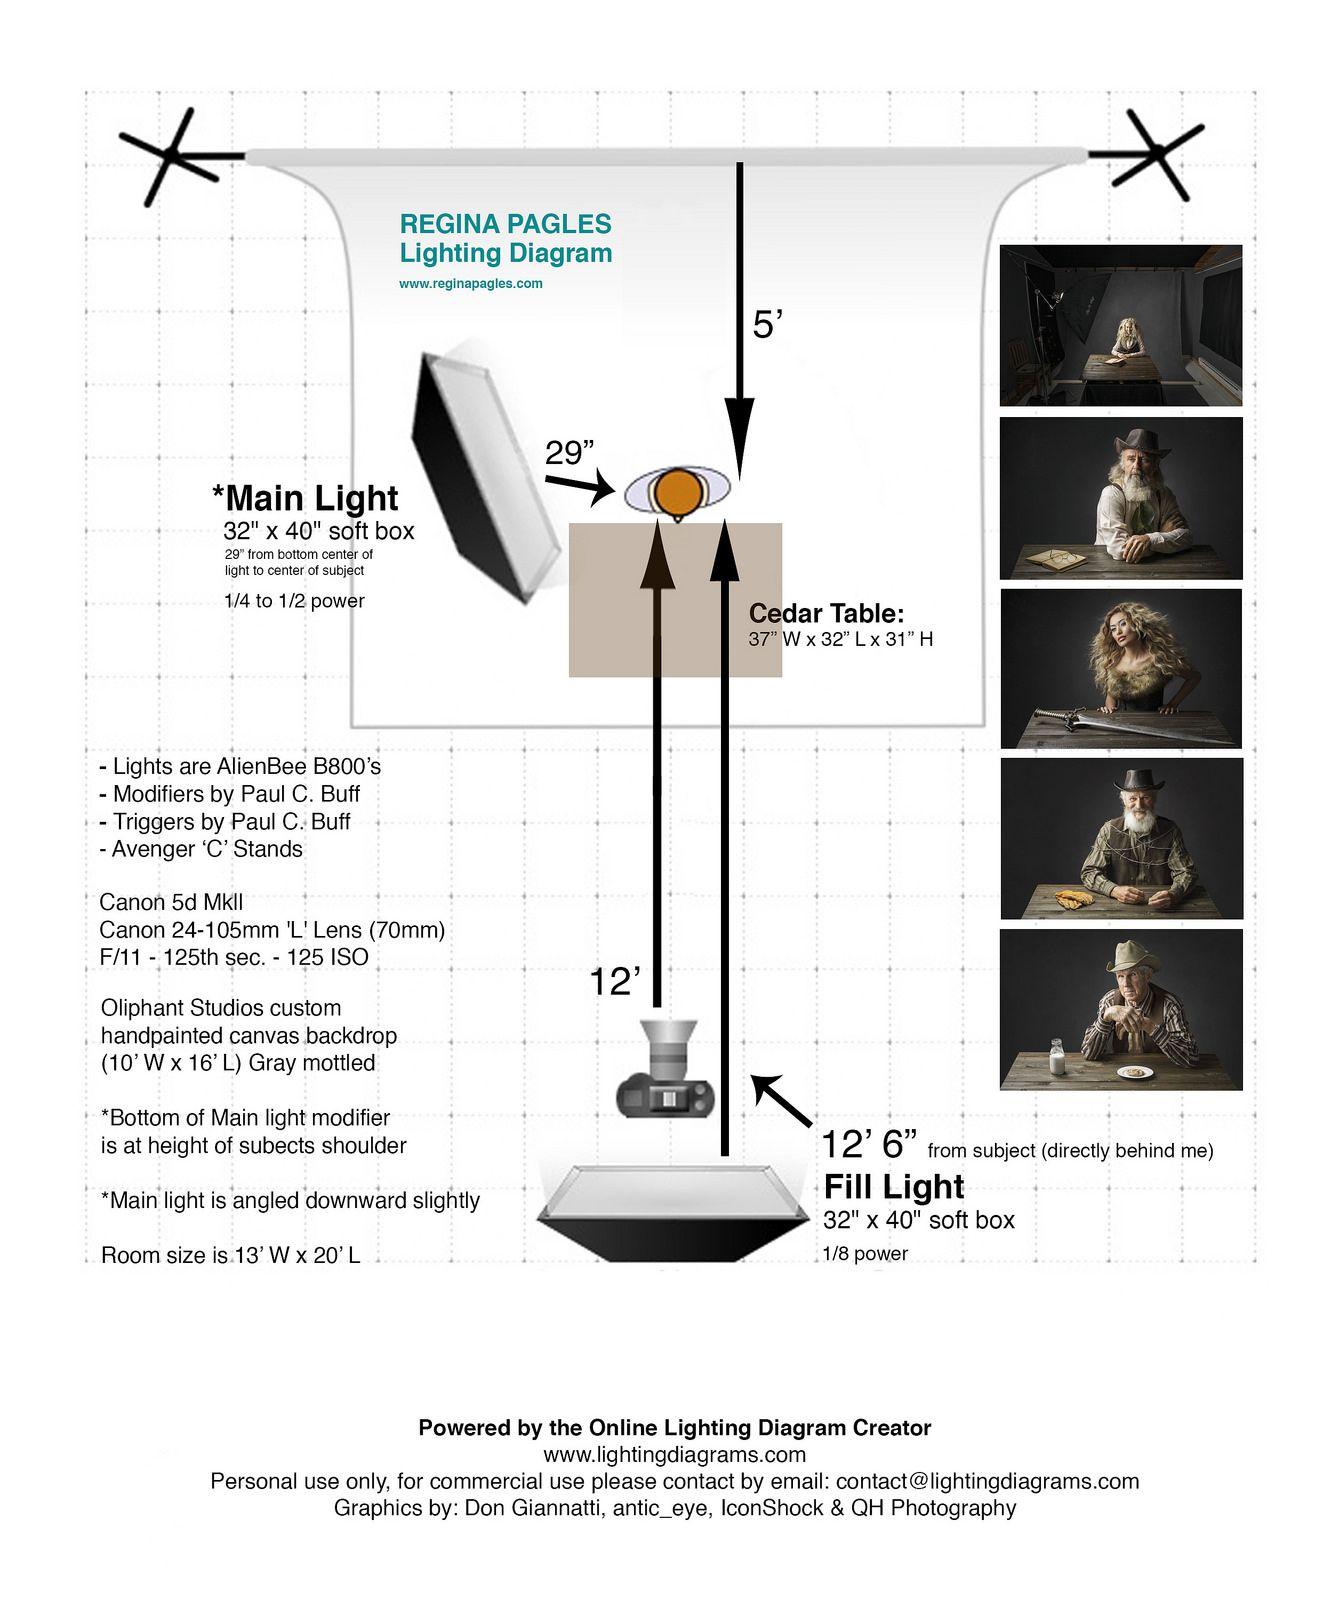 Regina pagles lighting diagram diagram lighting setups and lights regina pagles lighting diagram flickr photo sharing ccuart Images